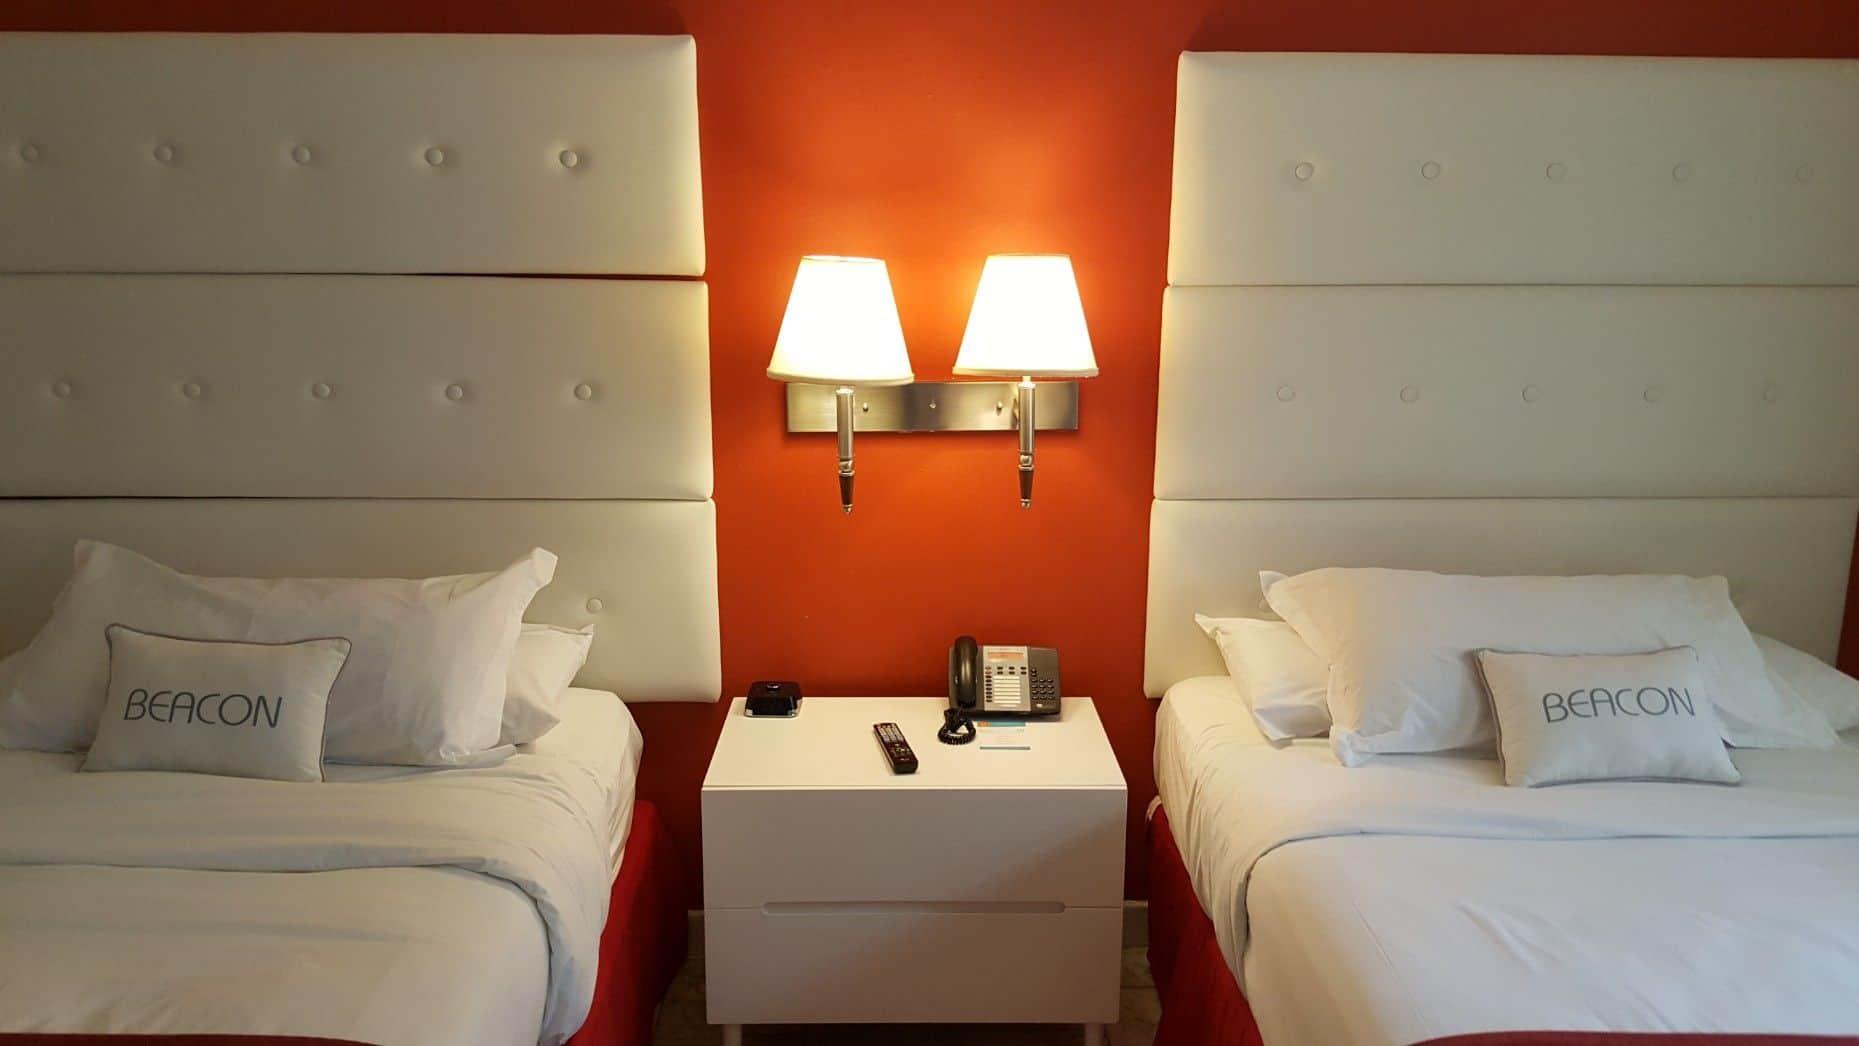 Beacon Hotel South beach review